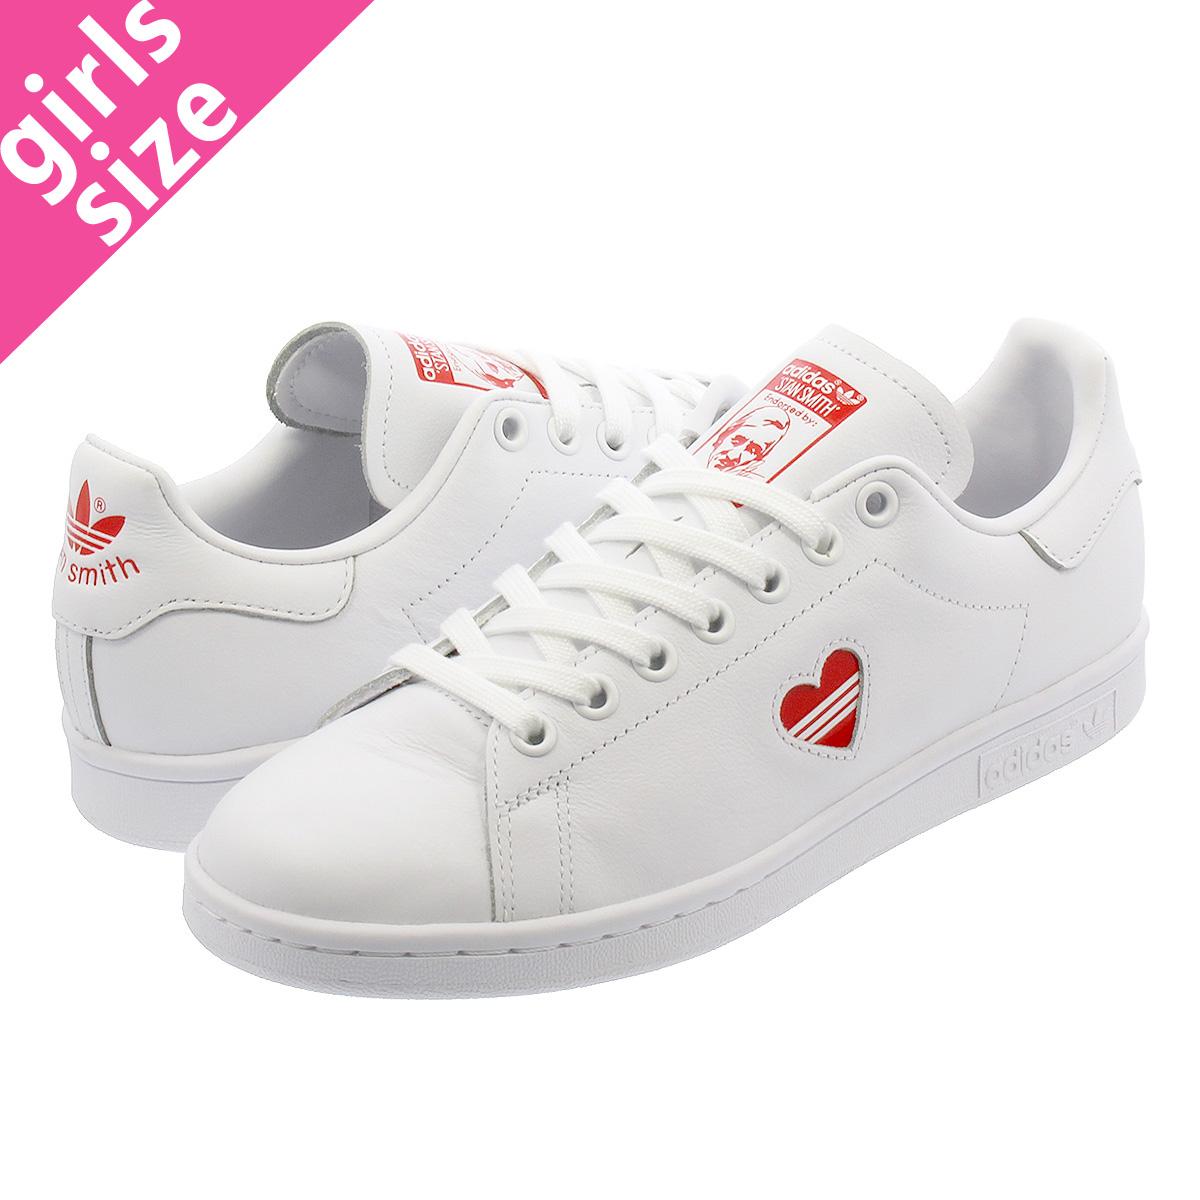 new concept faf71 bed46 adidas STAN SMITH W Adidas Stan Smith W RUNNING WHITE/ACTIVE RED/RUNNING  WHITE g27893